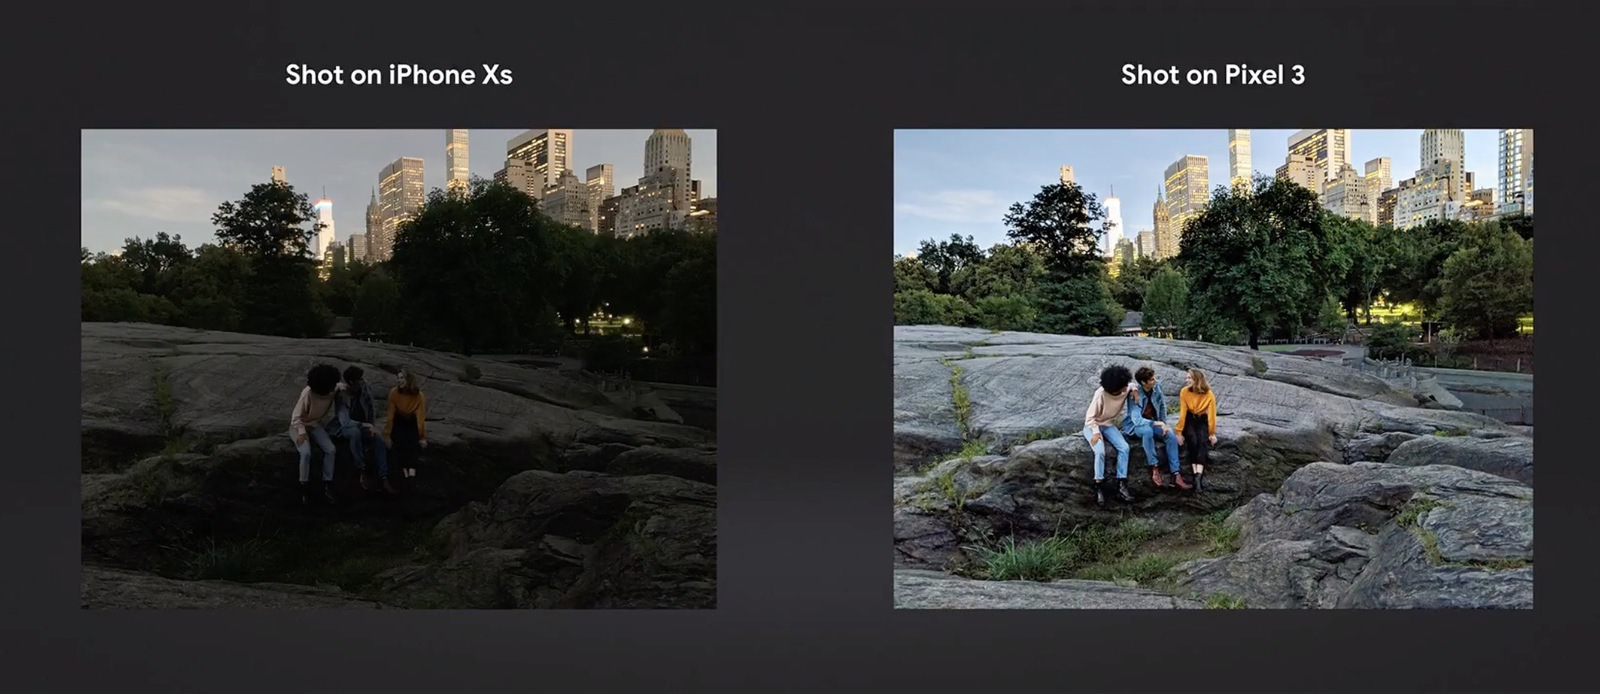 Google Pixel 3 Camera Features 12